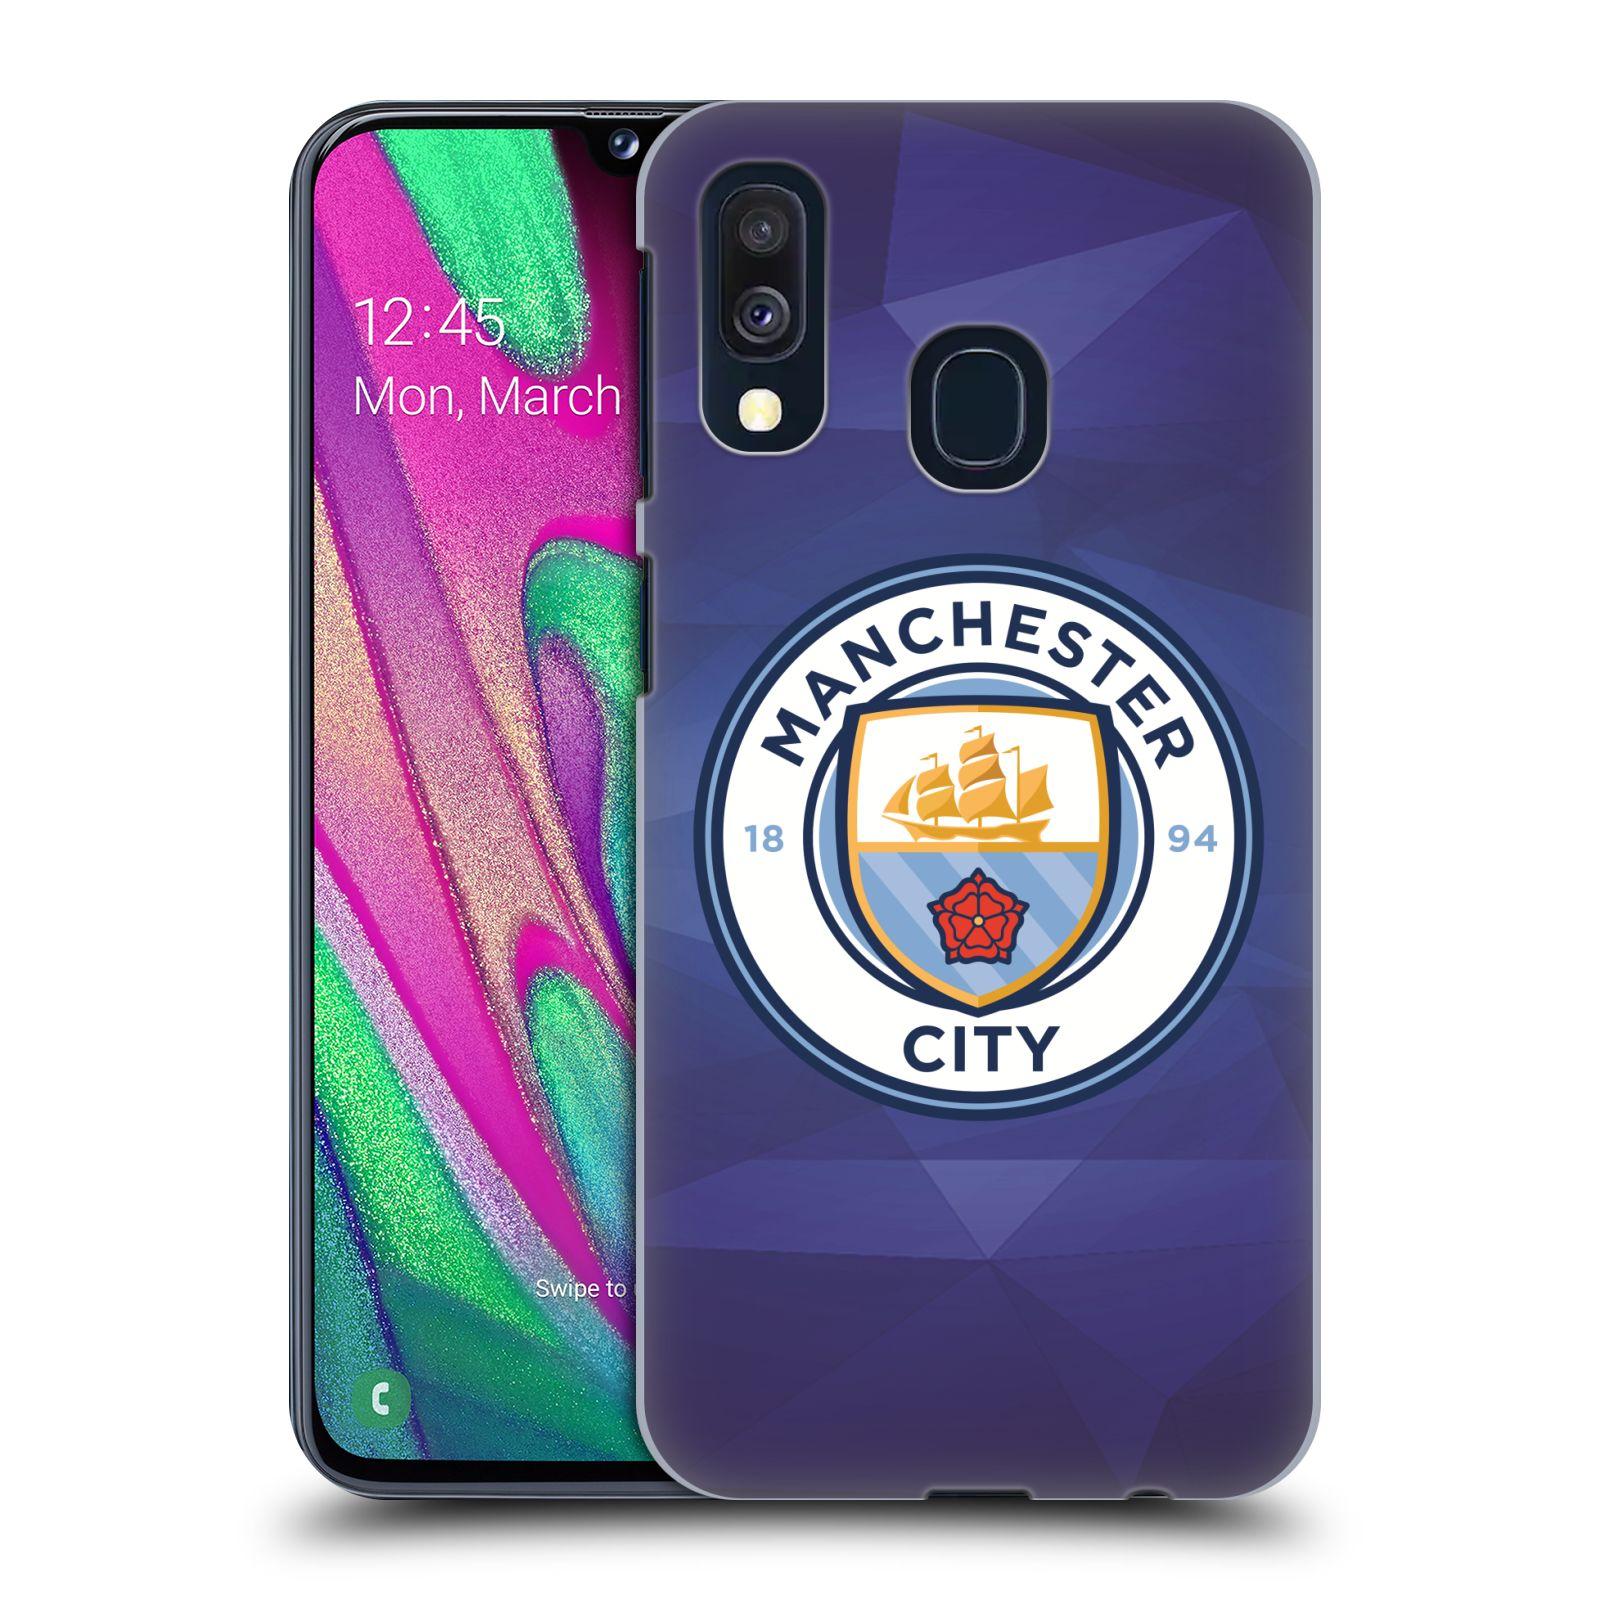 Plastové pouzdro na mobil Samsung Galaxy A40 - Head Case - Manchester City FC - Modré nové logo